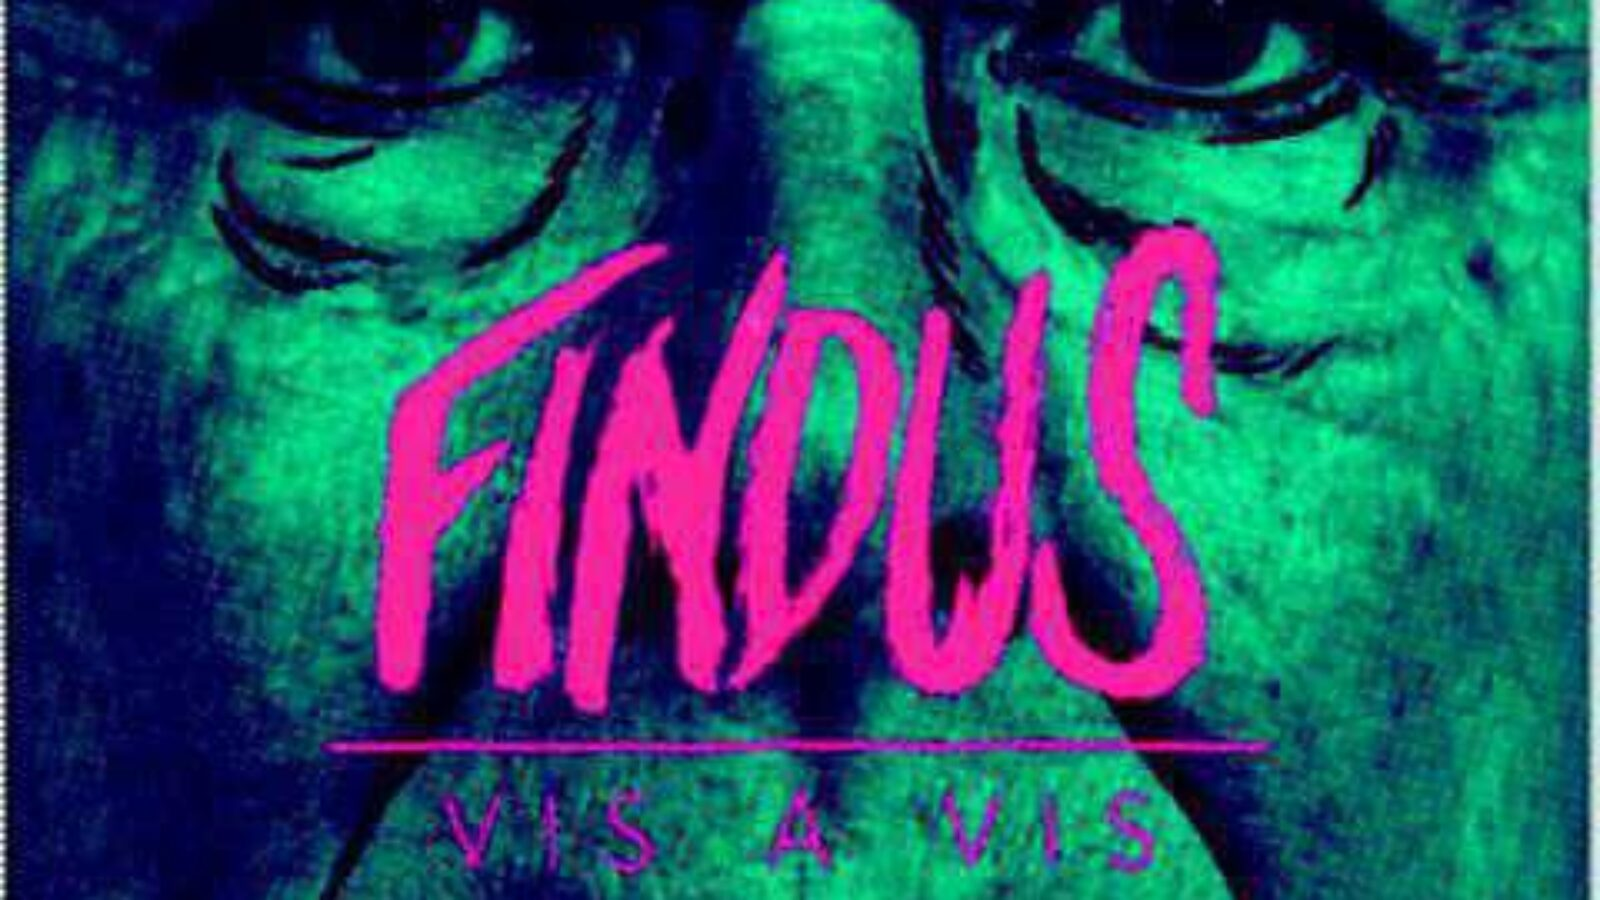 FINDUS Vis A Vis